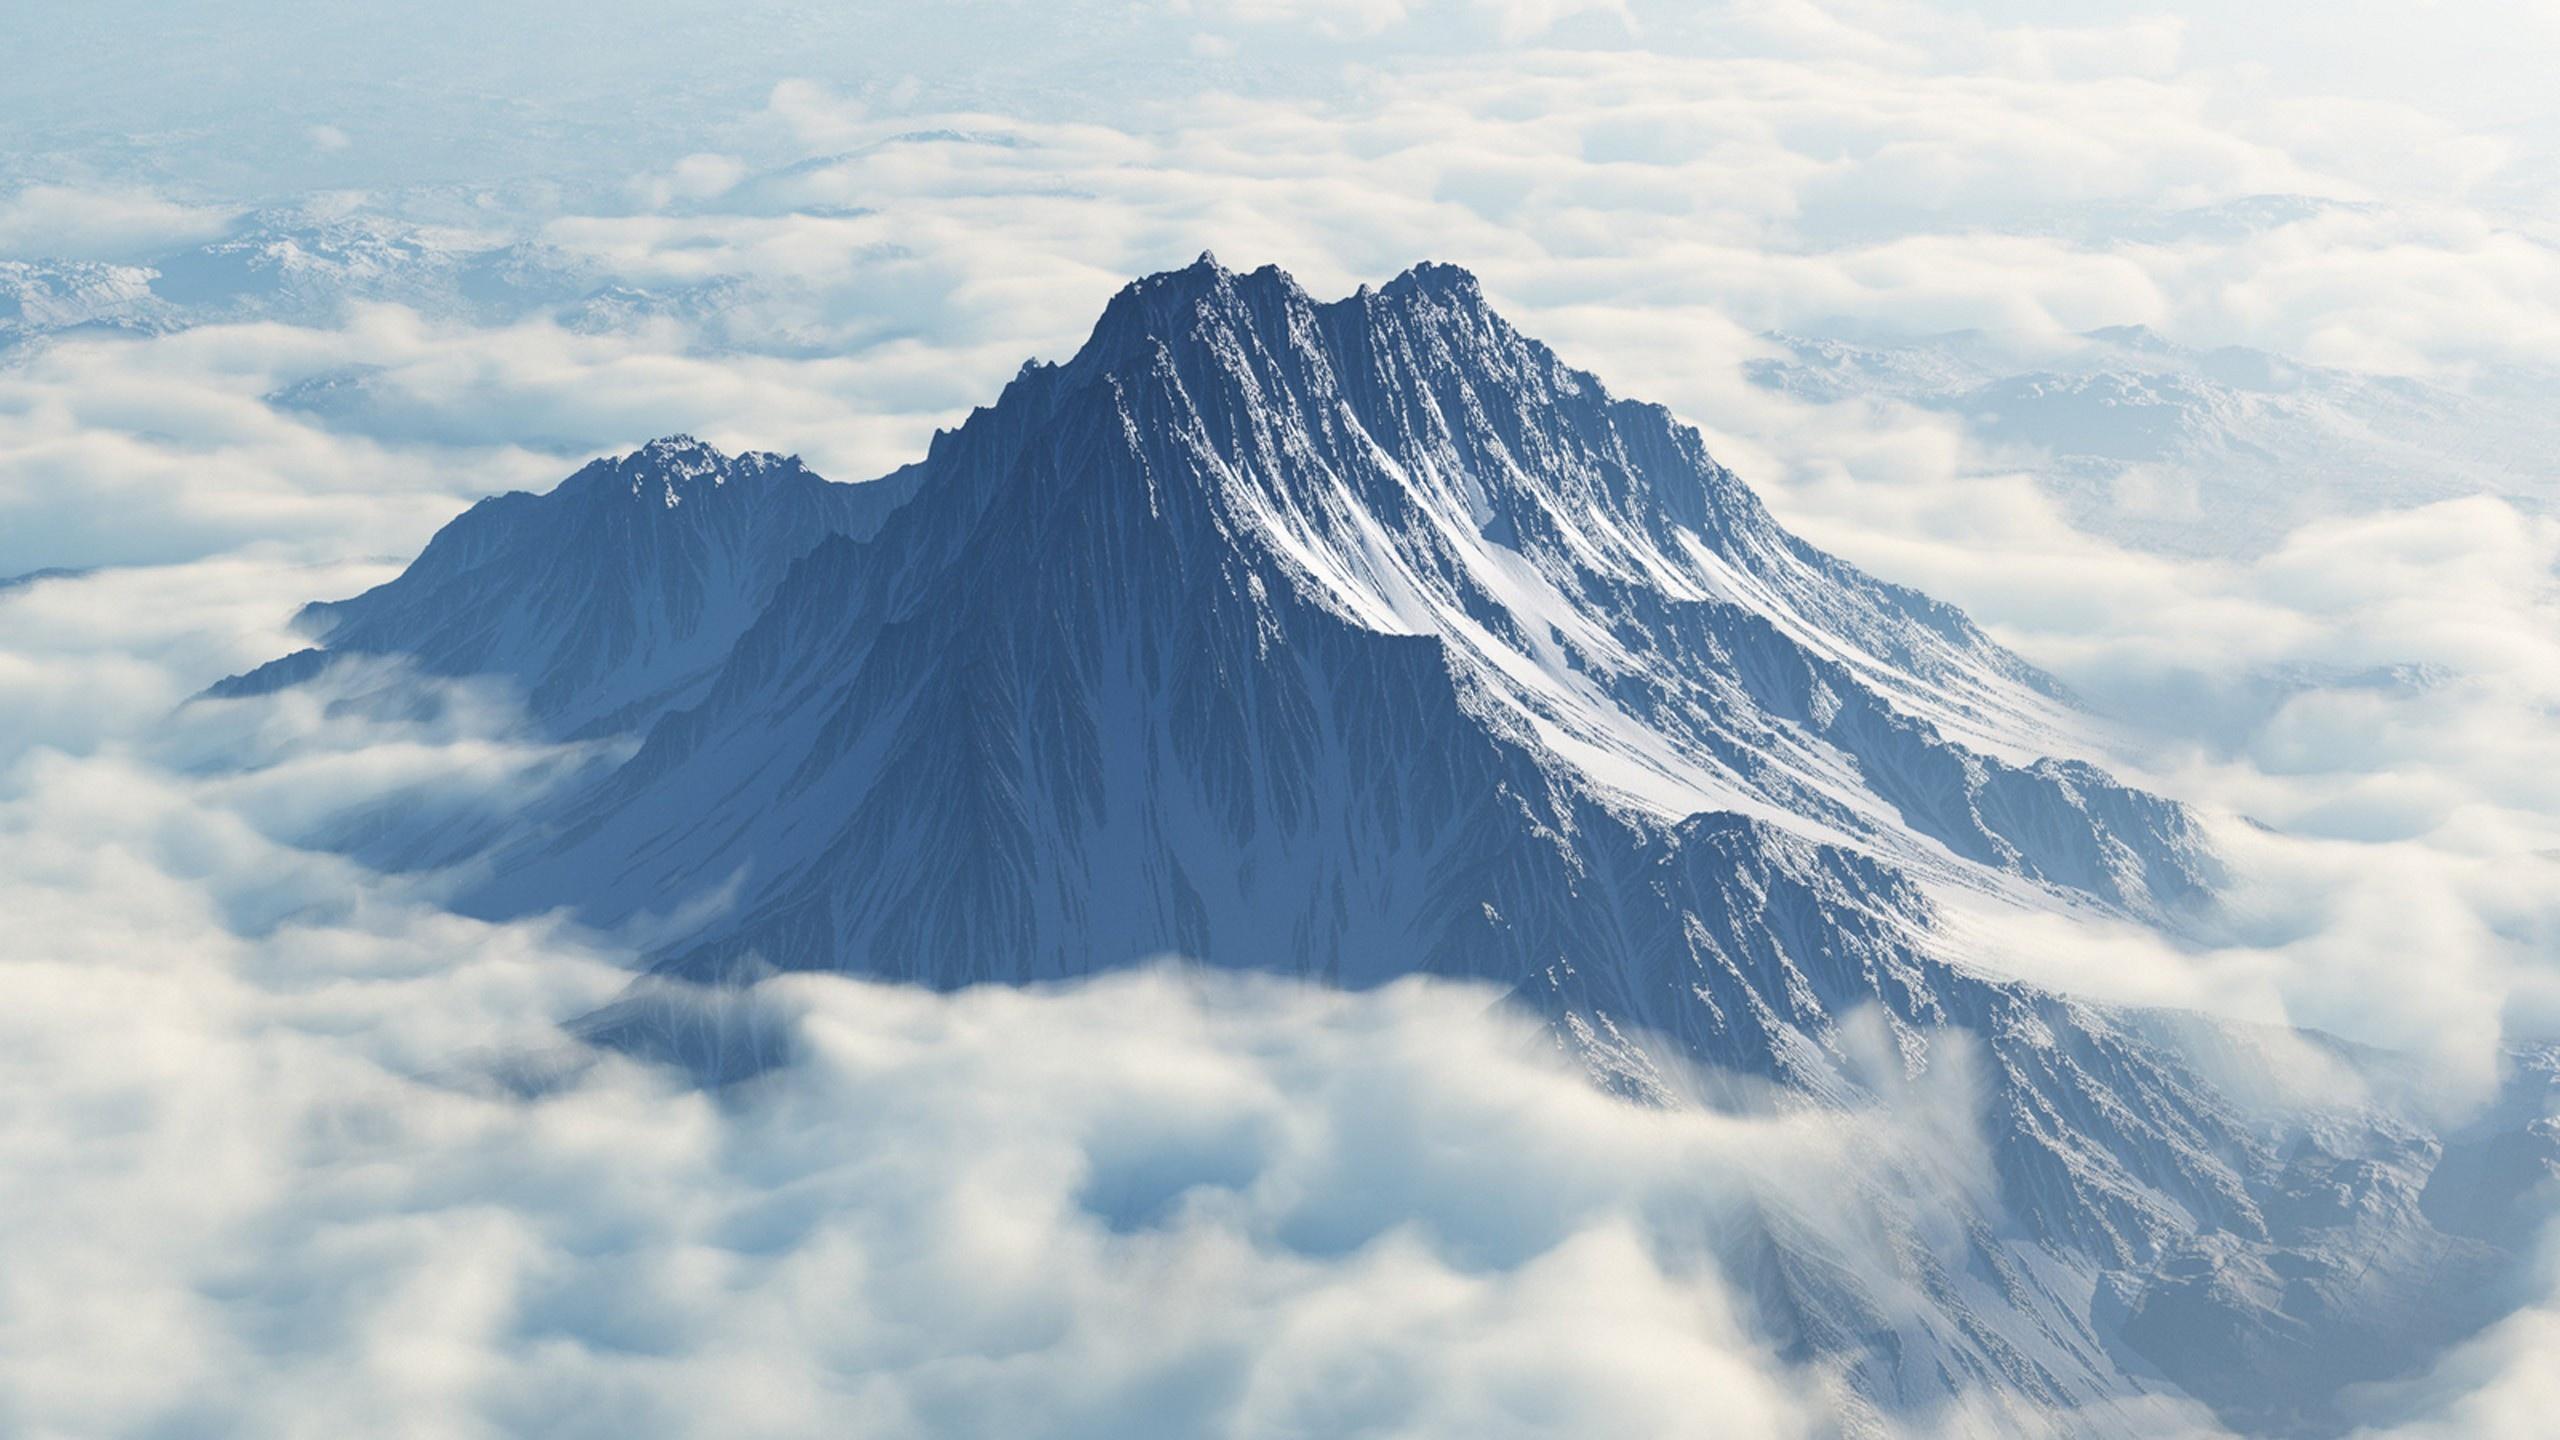 2560x1440 Mount Olympus Aerial View desktop PC and Mac wallpaper 2560x1440